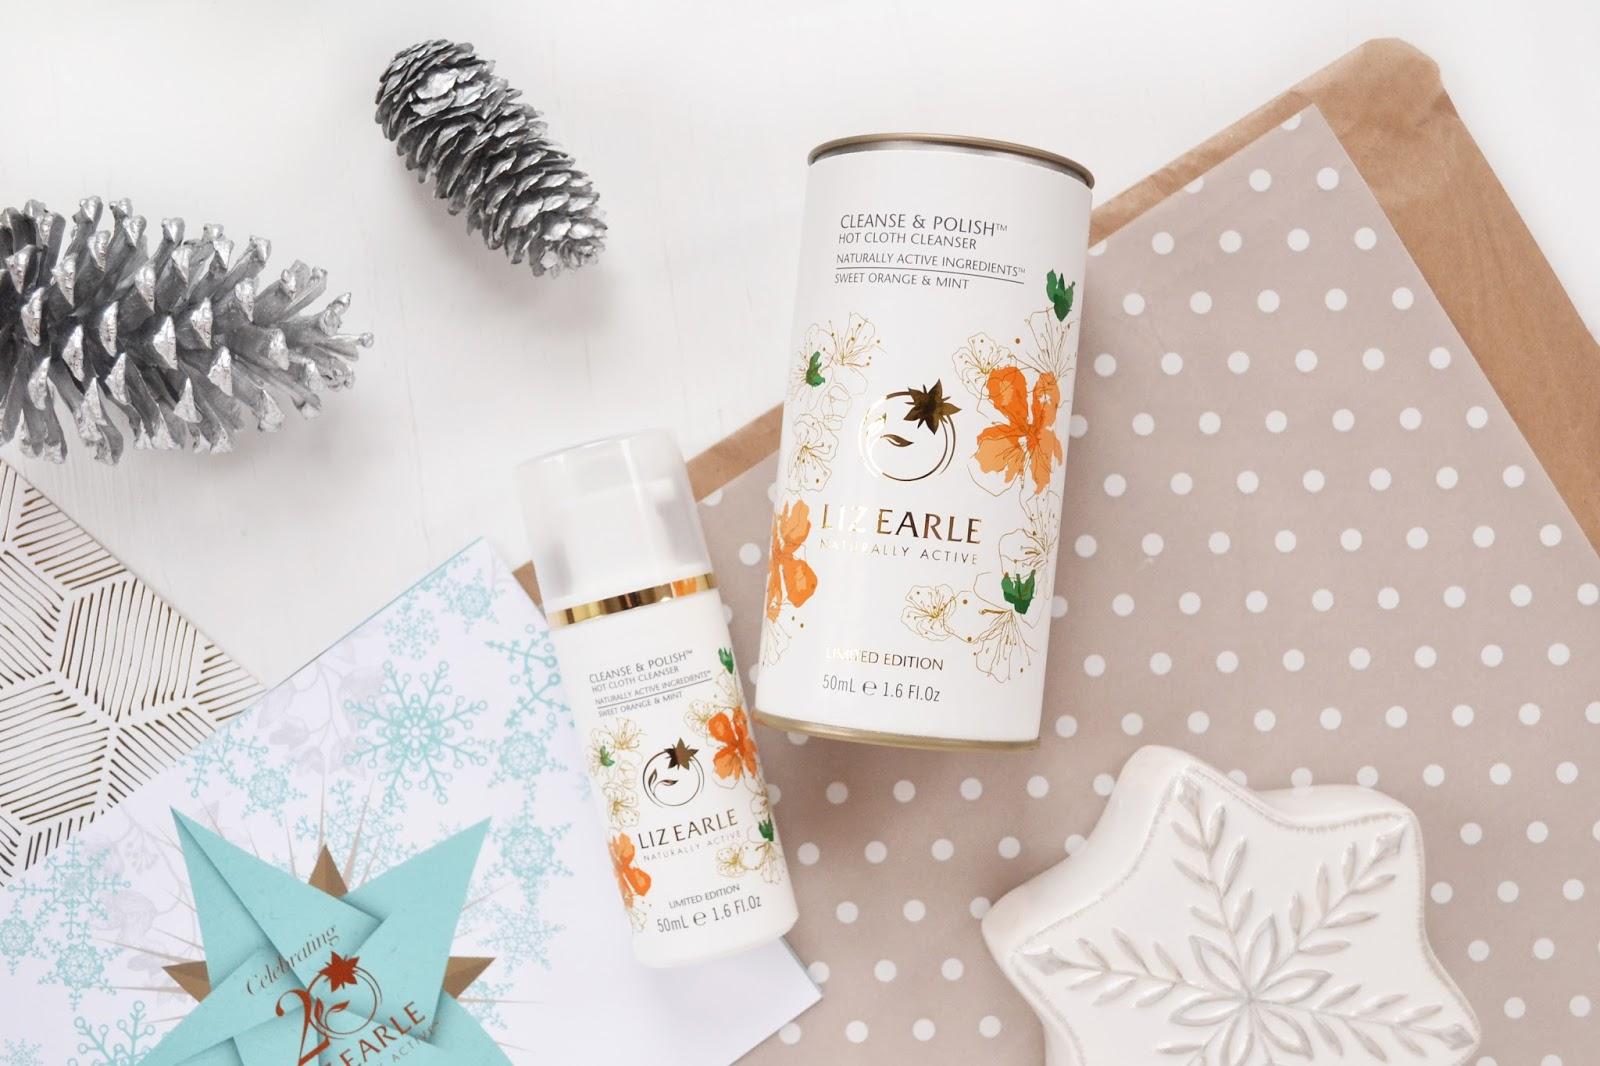 liz earle christmas gift sets